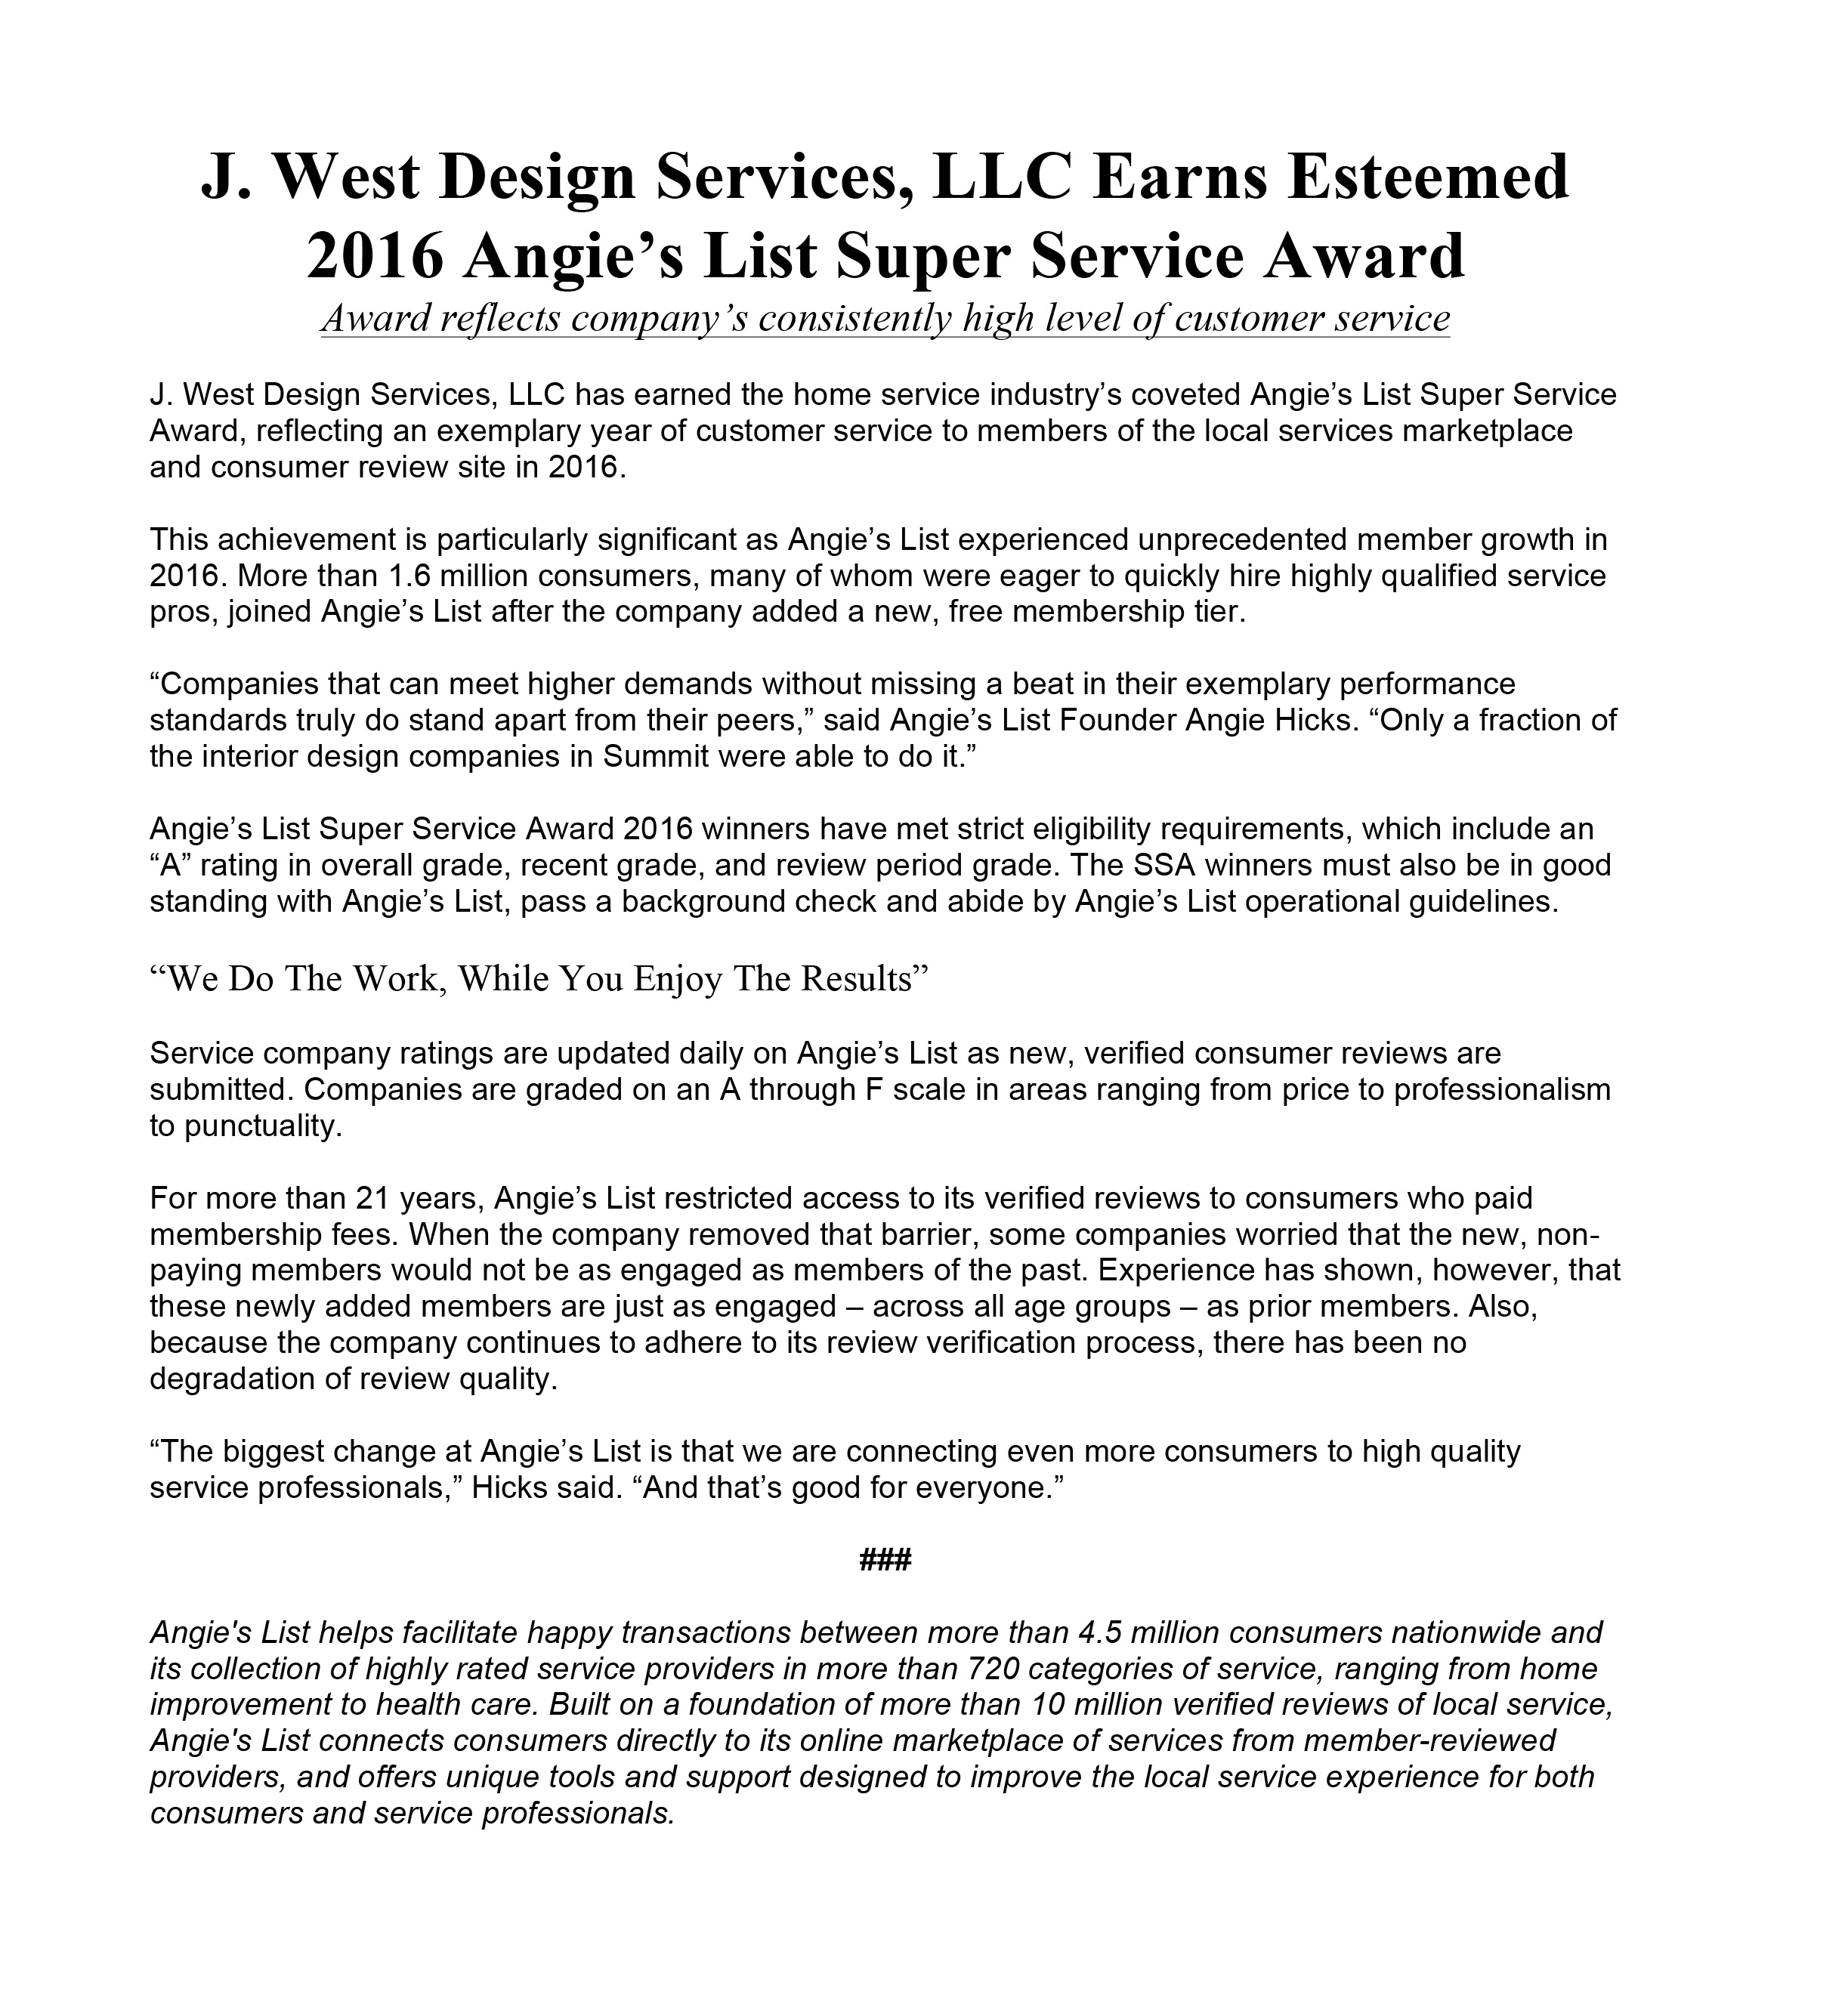 J. West Design Services Earns Esteemed 2016 Angie's List Super Service Award